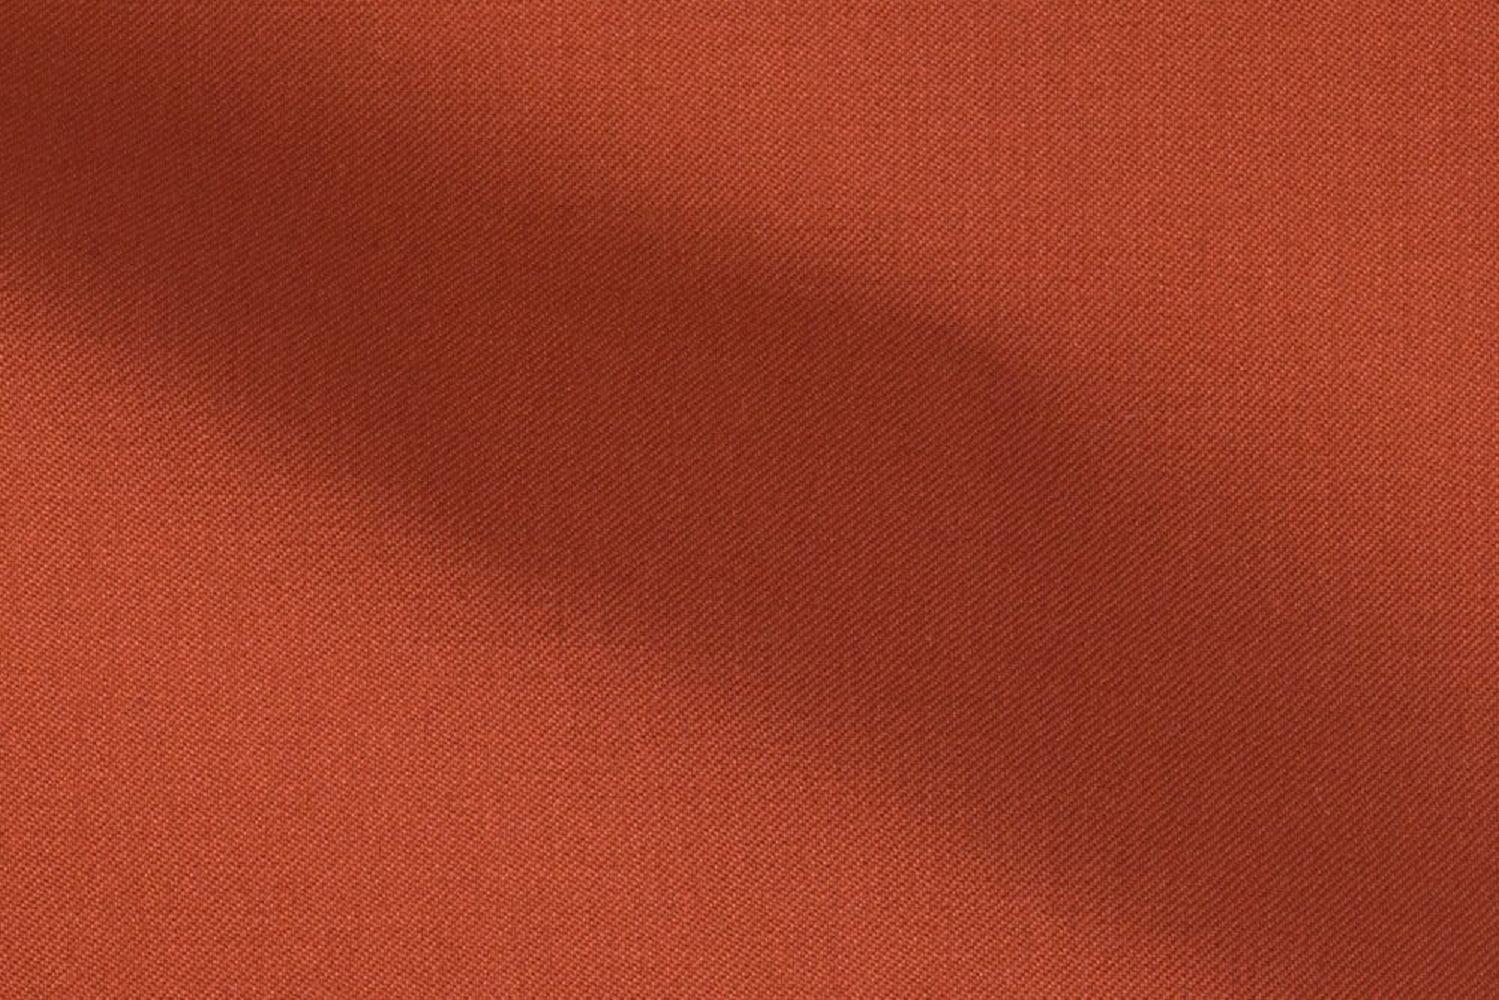 Burnt Orange Plain